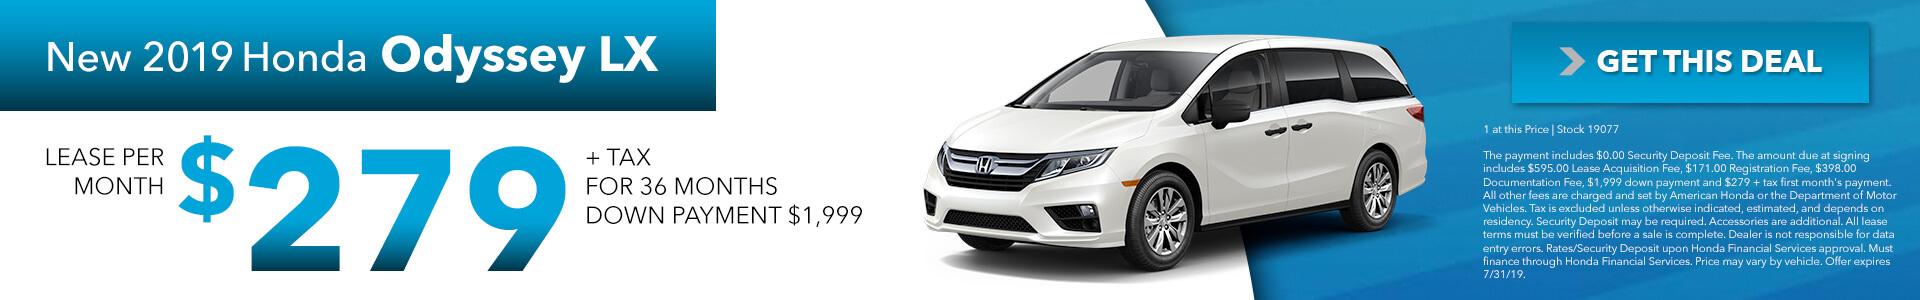 2019 Honda Odyssey LX  $279 per month